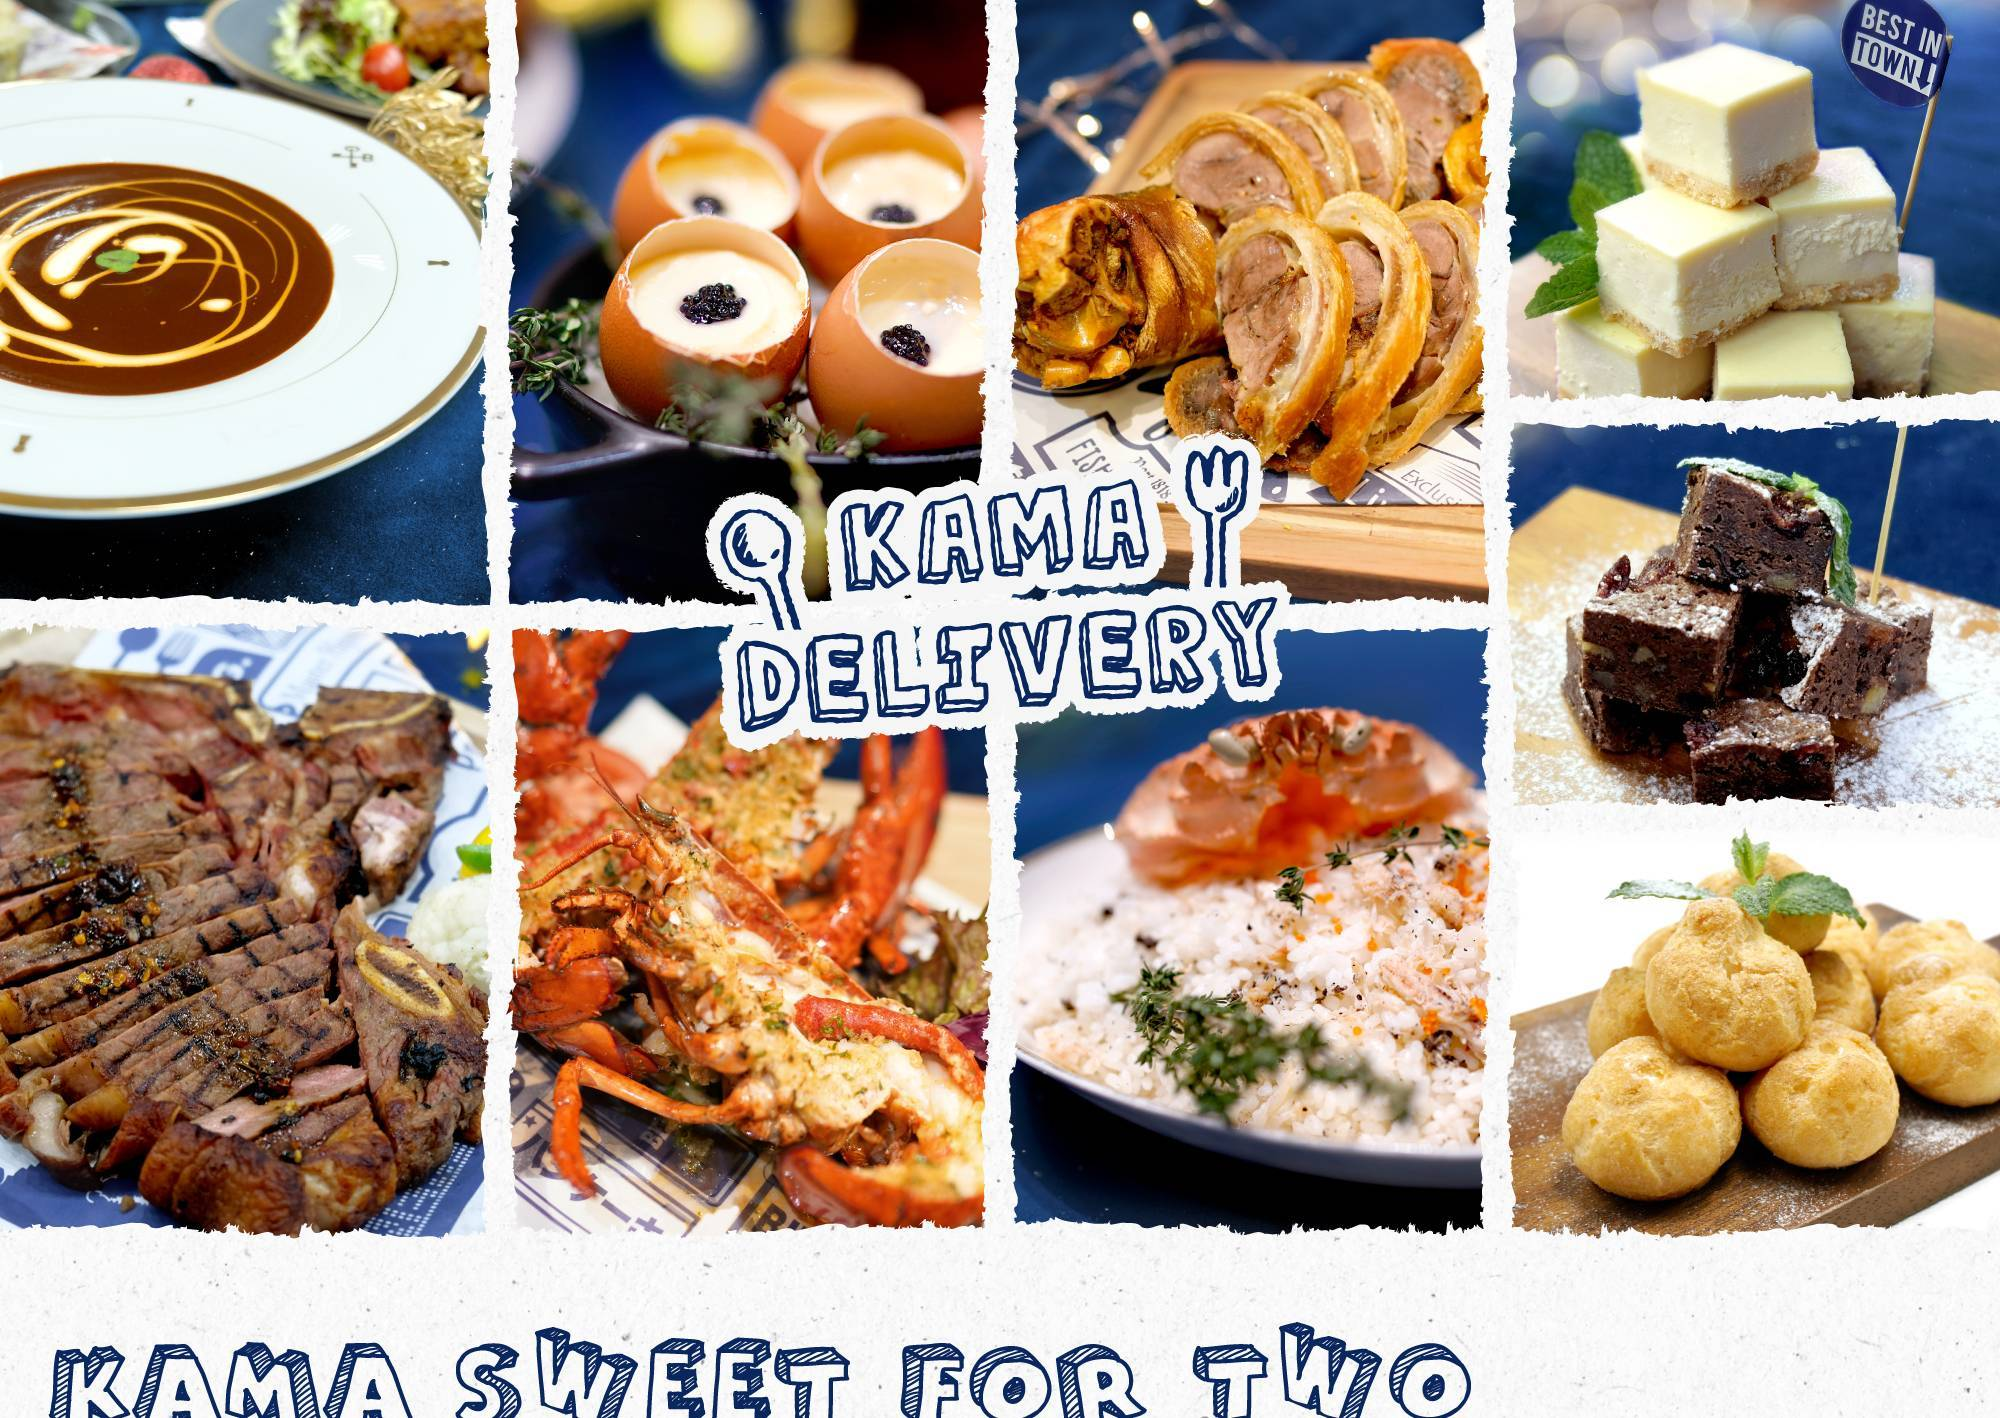 情人節去邊食|到會外賣套餐推介|Kama Delivery 推出的Sweet for Two浪漫情人節晚餐外賣配送|2月14日在家慶祝|Staycation享用